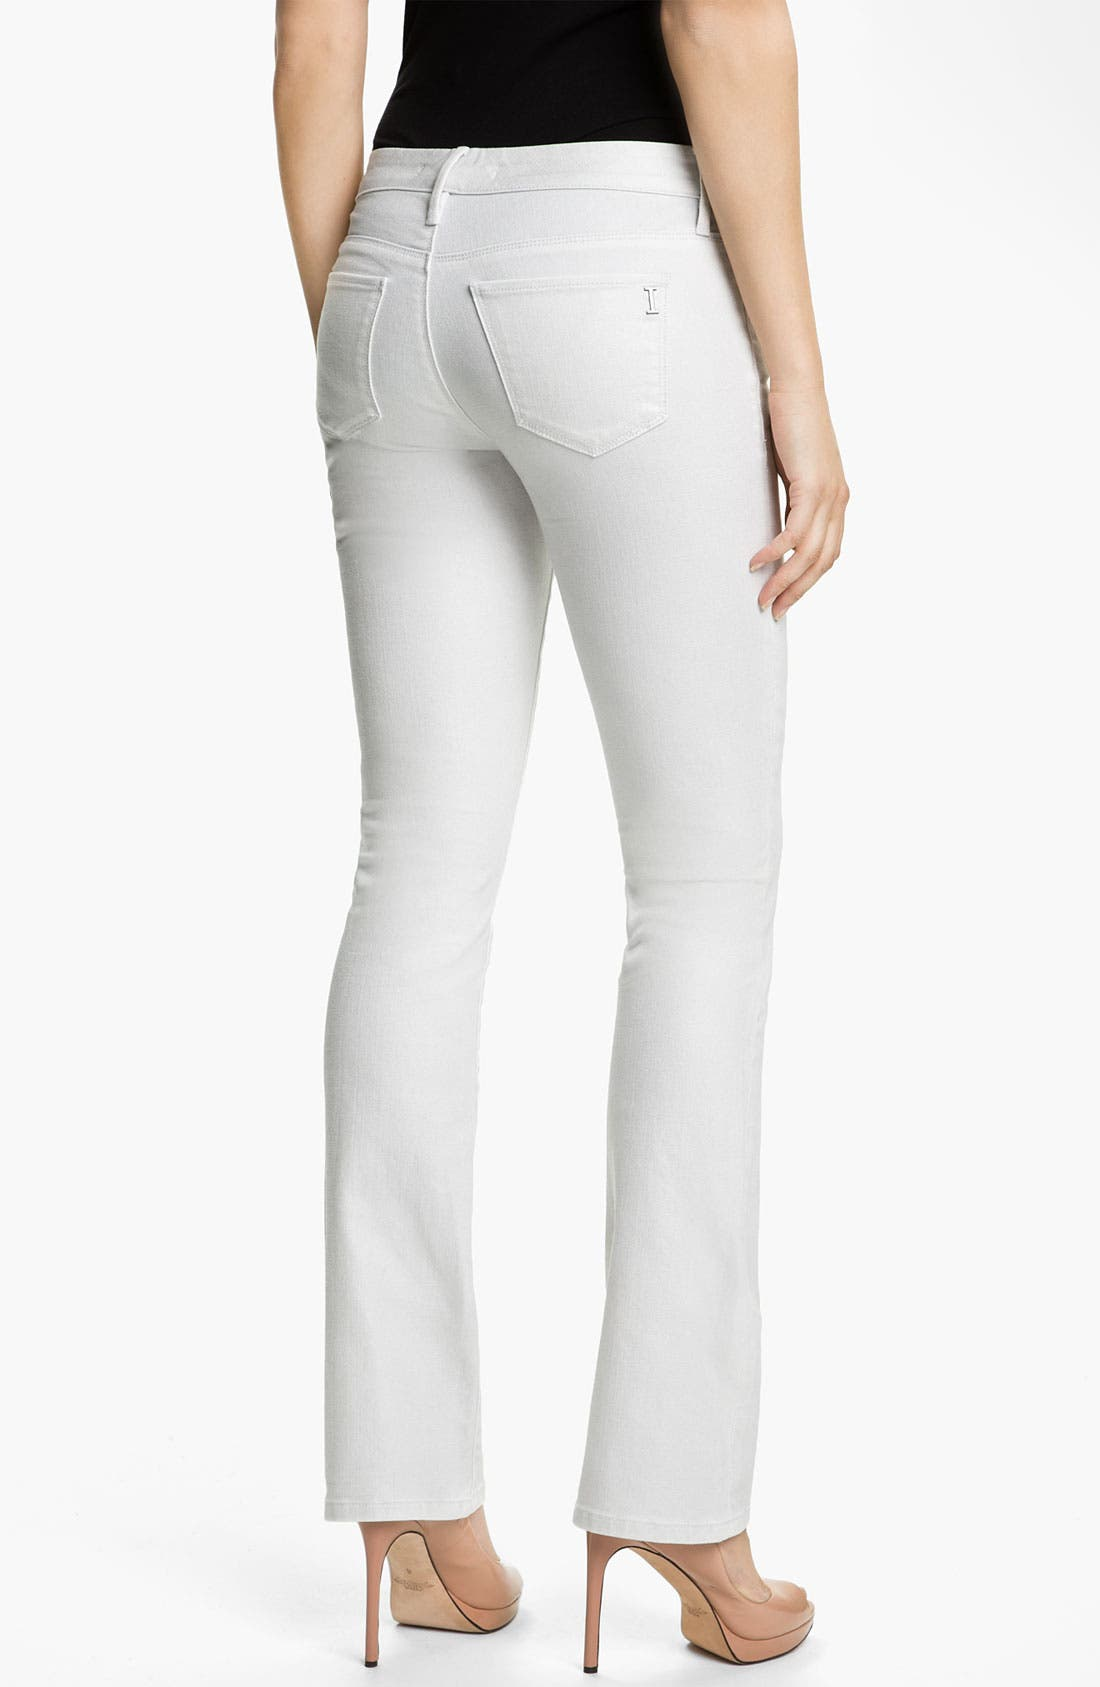 Alternate Image 2  - Isaac Mizrahi Jeans 'Skylar' Slim Bootcut Jeans